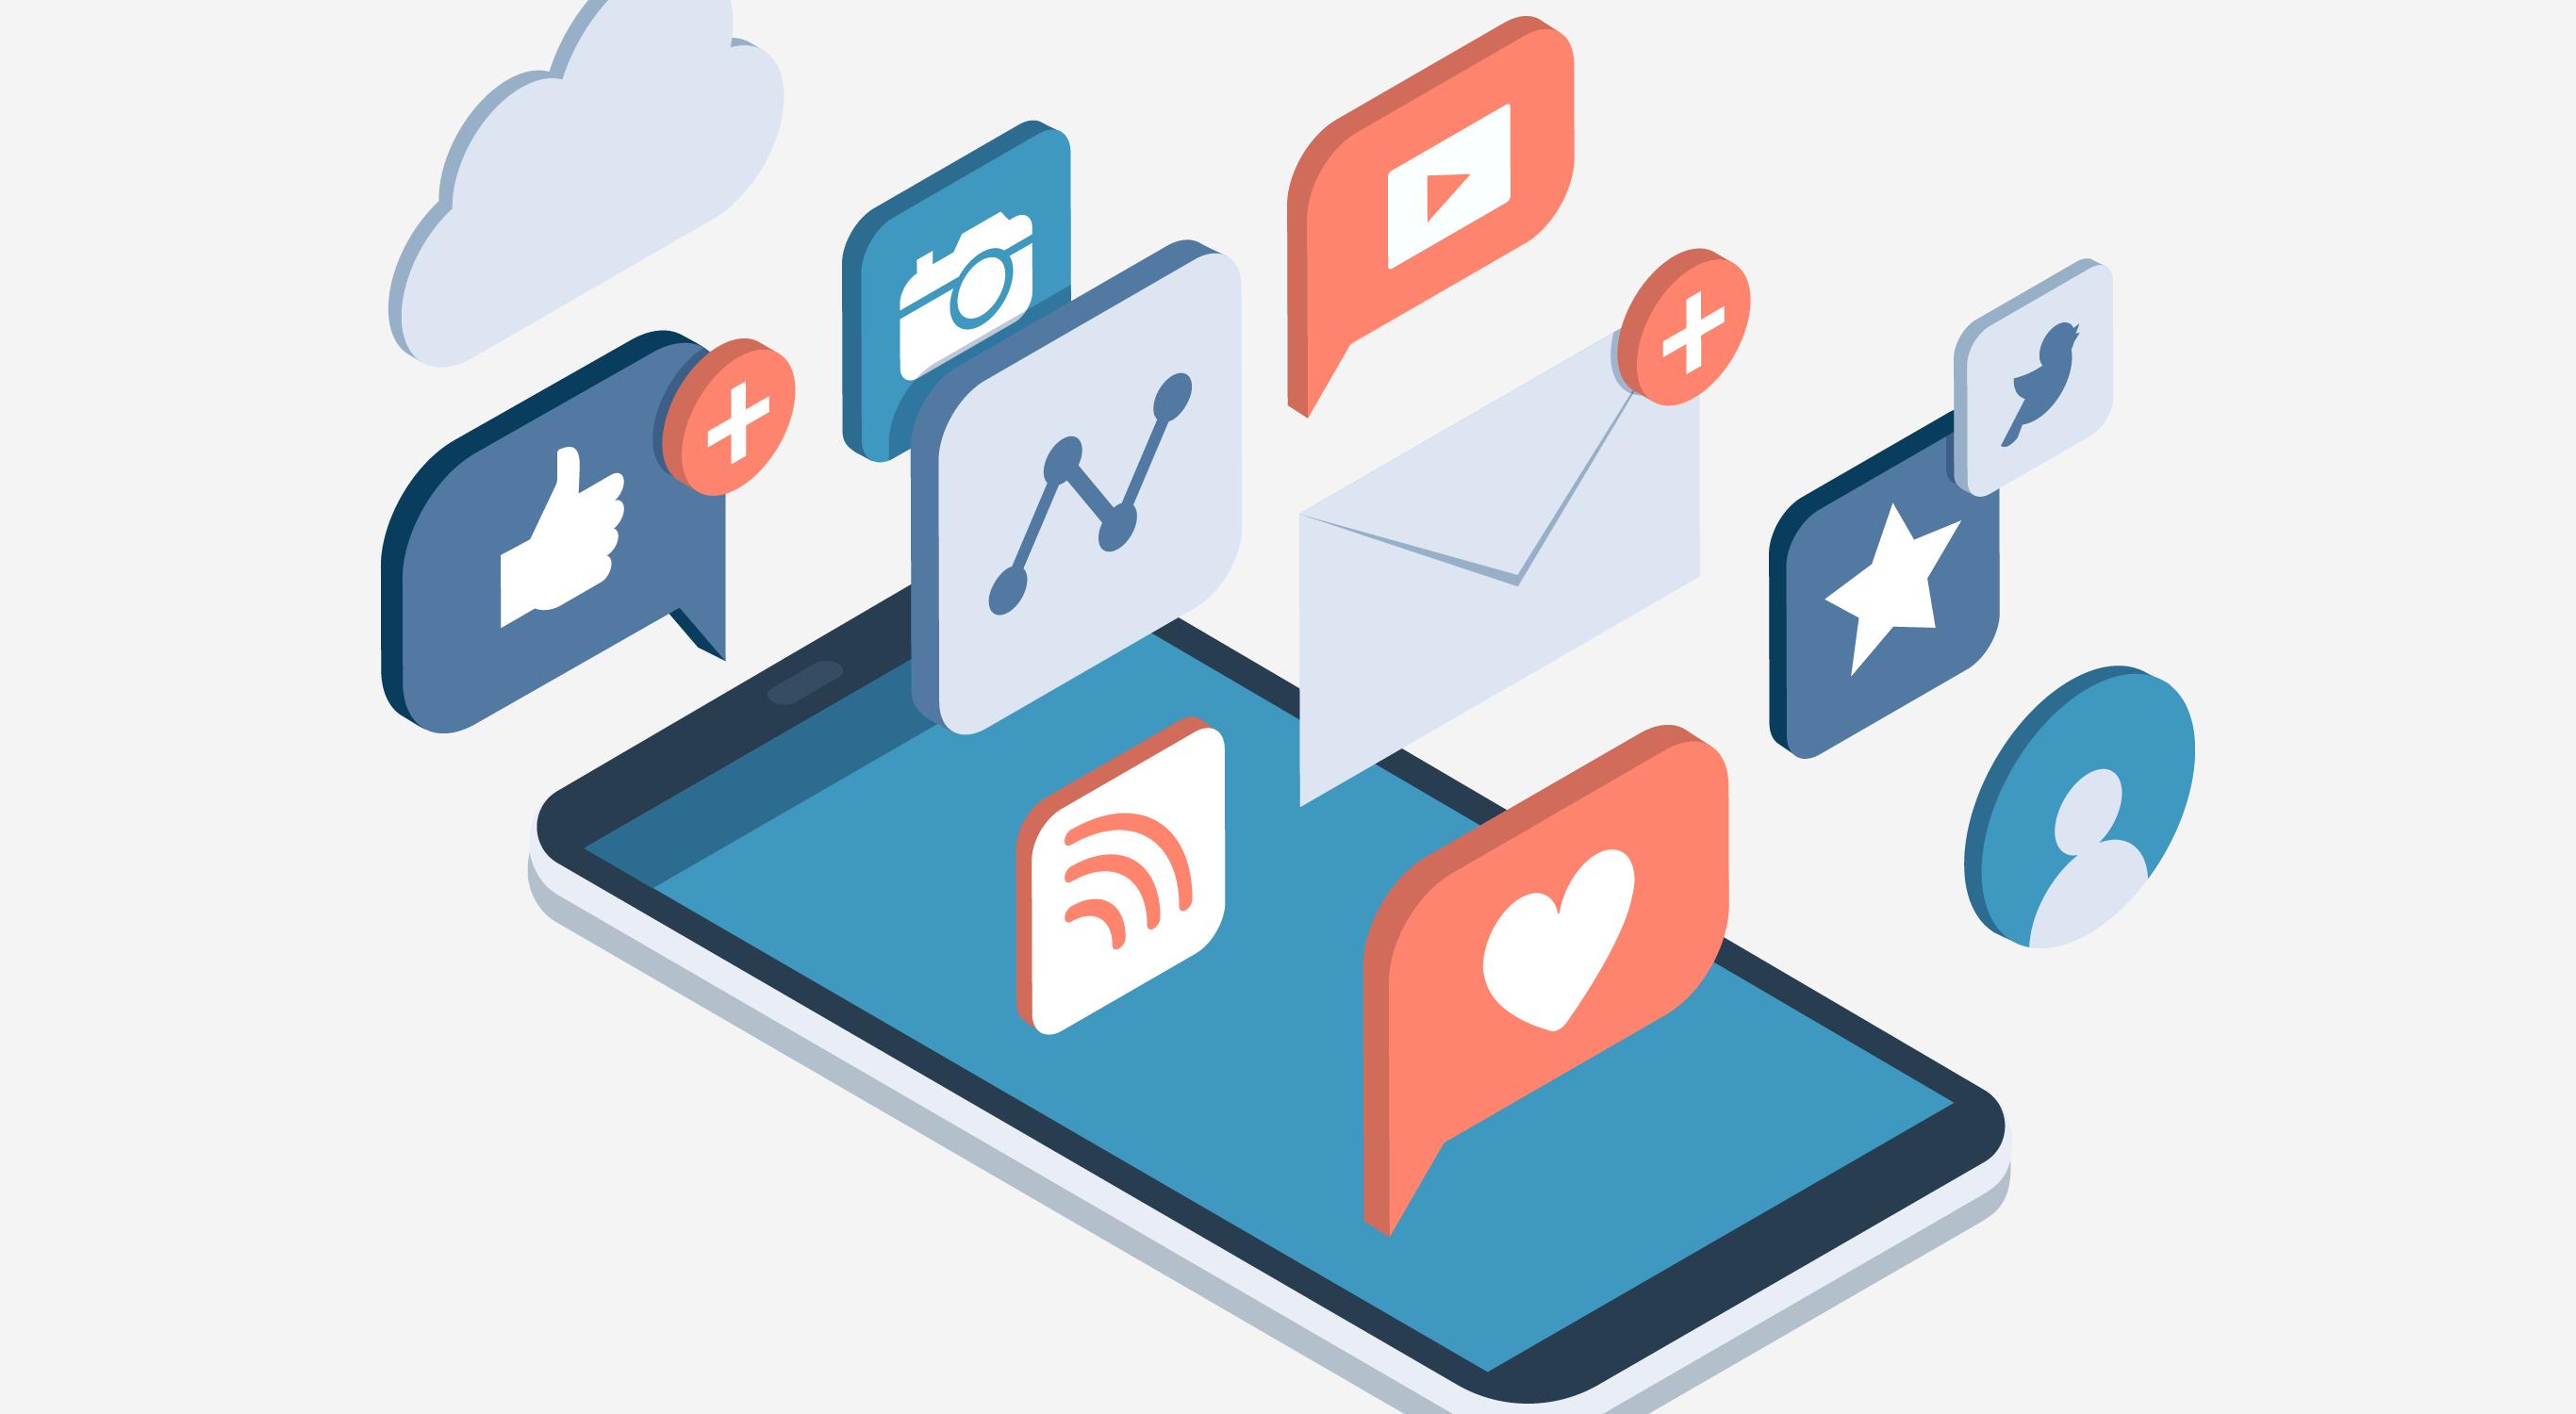 illustration of social media apps over phone